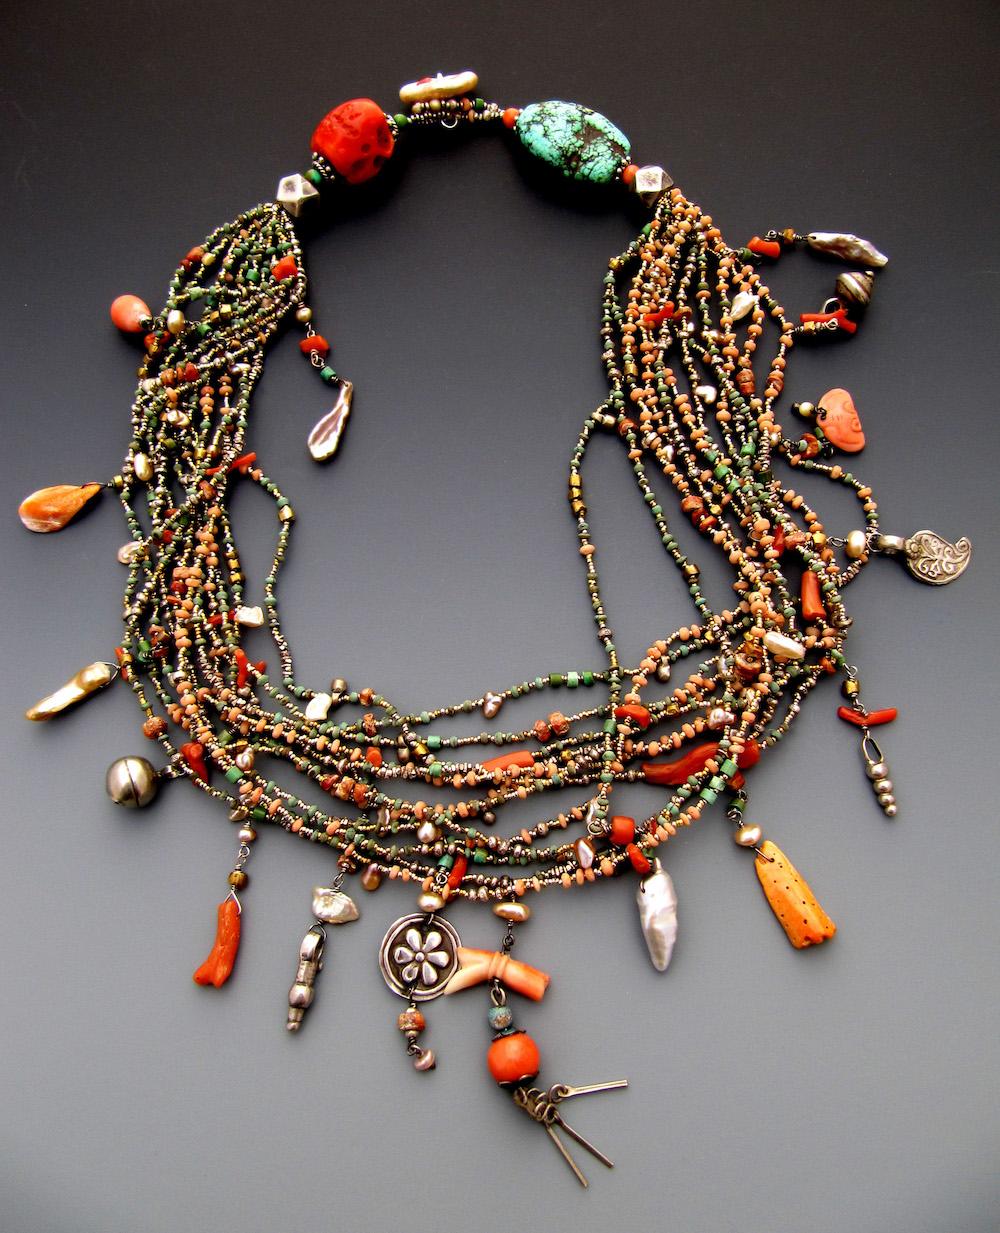 An example of Lucia Antonelli's beaded jewelry.